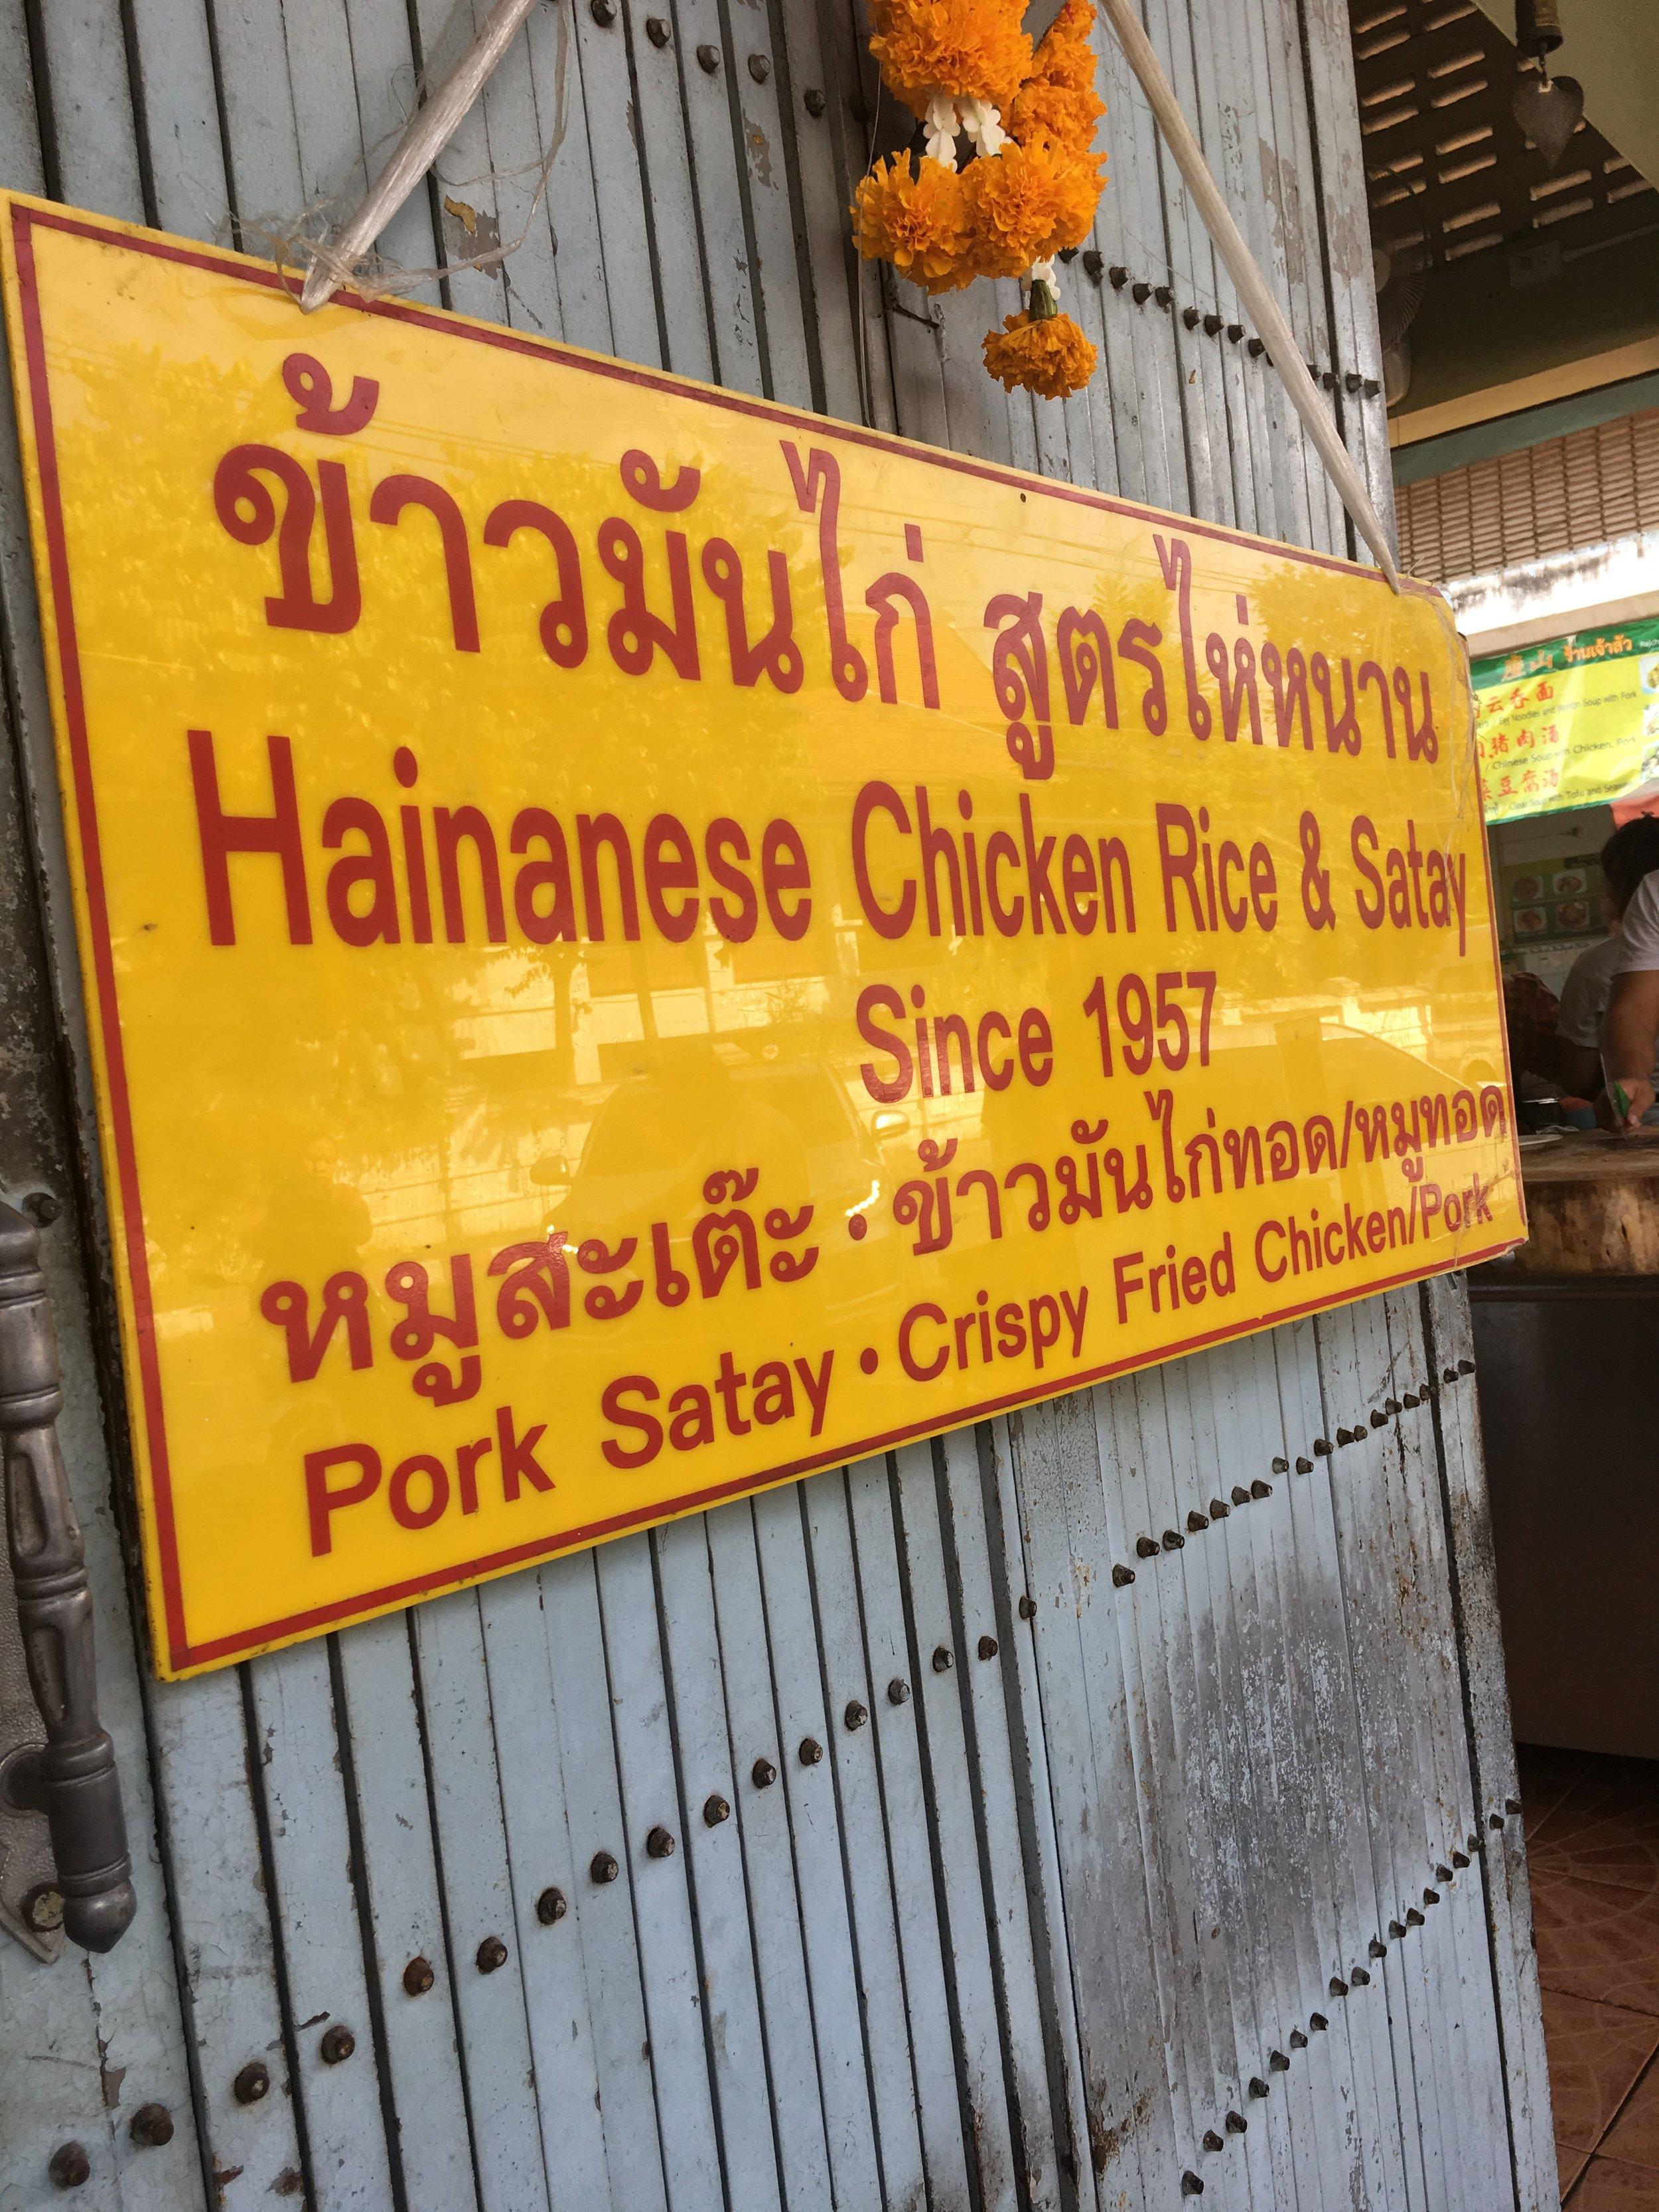 Hainese Chicken Rice & Satay